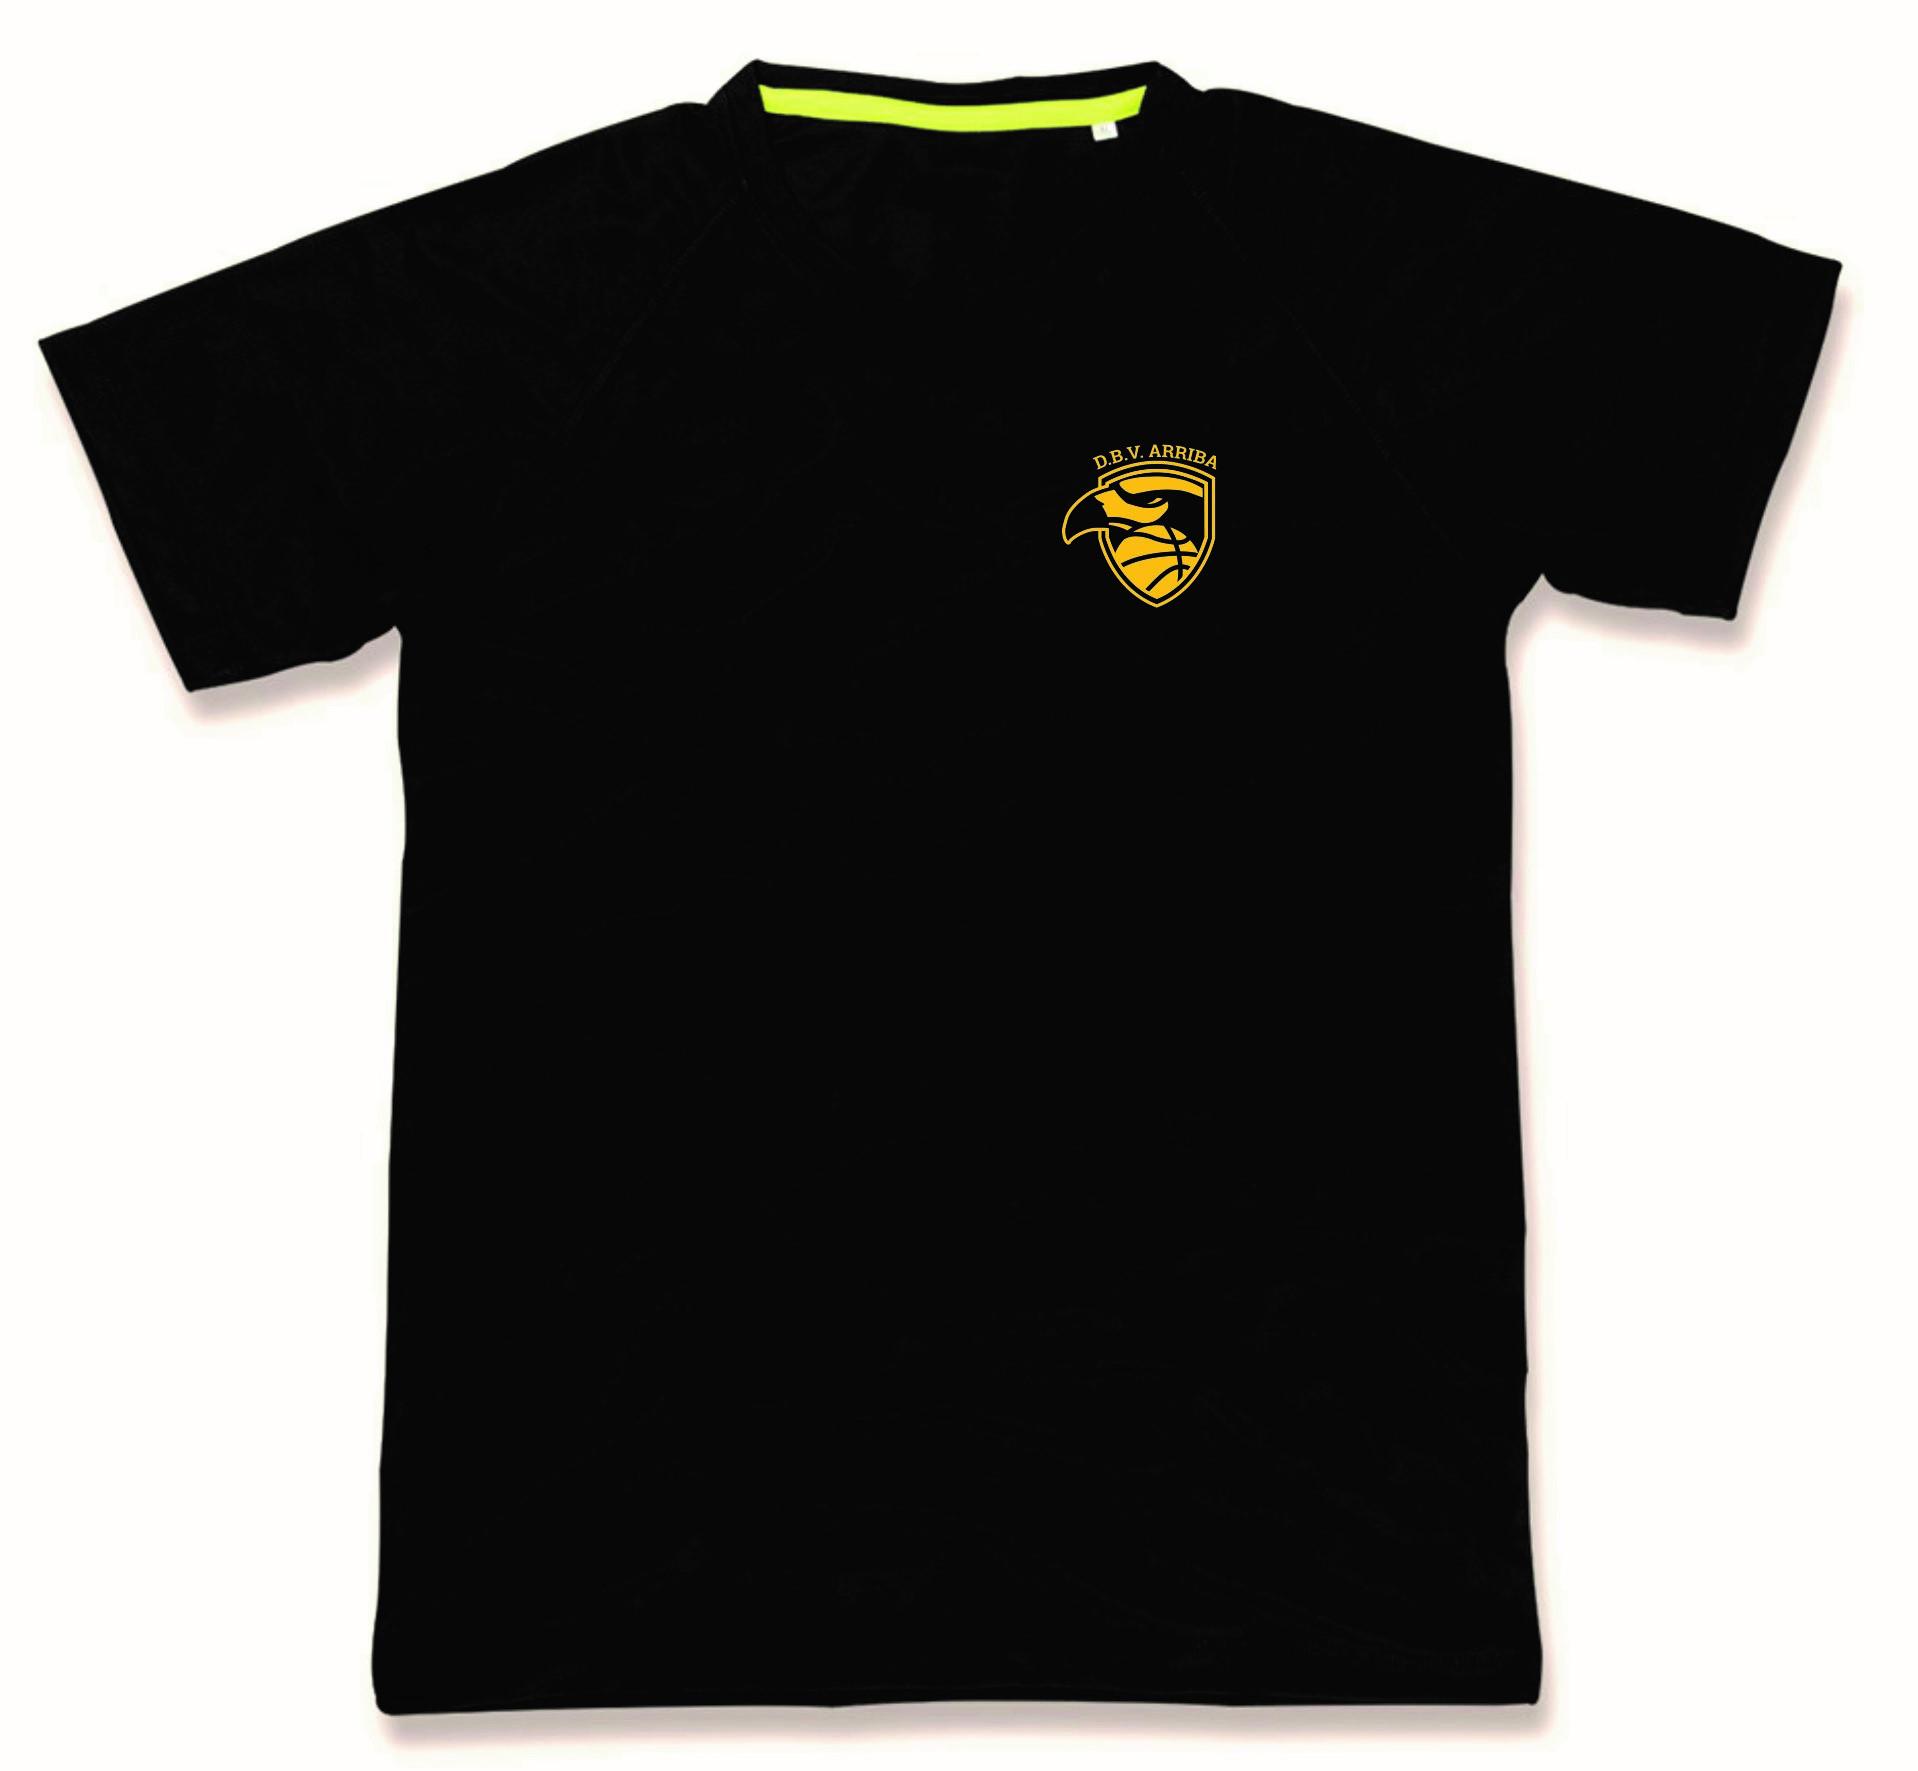 Sports shirt men (small logo) Image